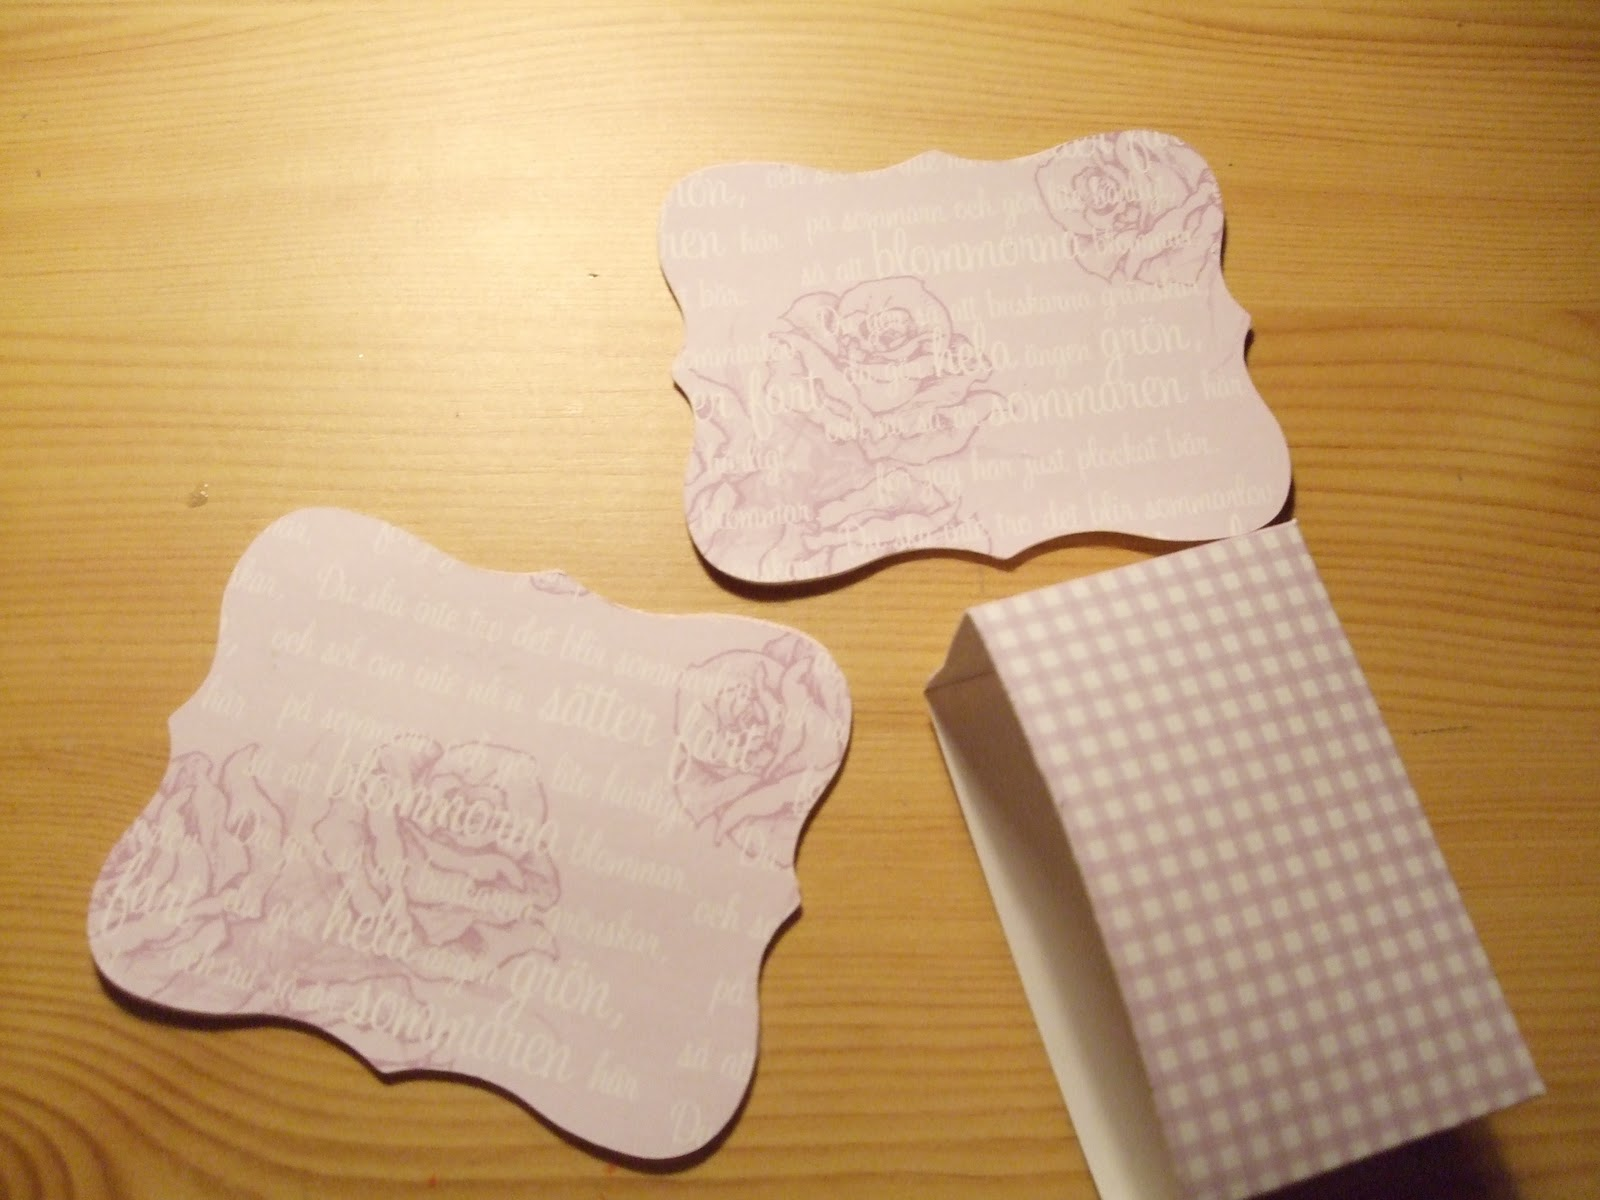 How-to-DIY-Handbag-Style-Paper-Gift-Basket-5.jpg